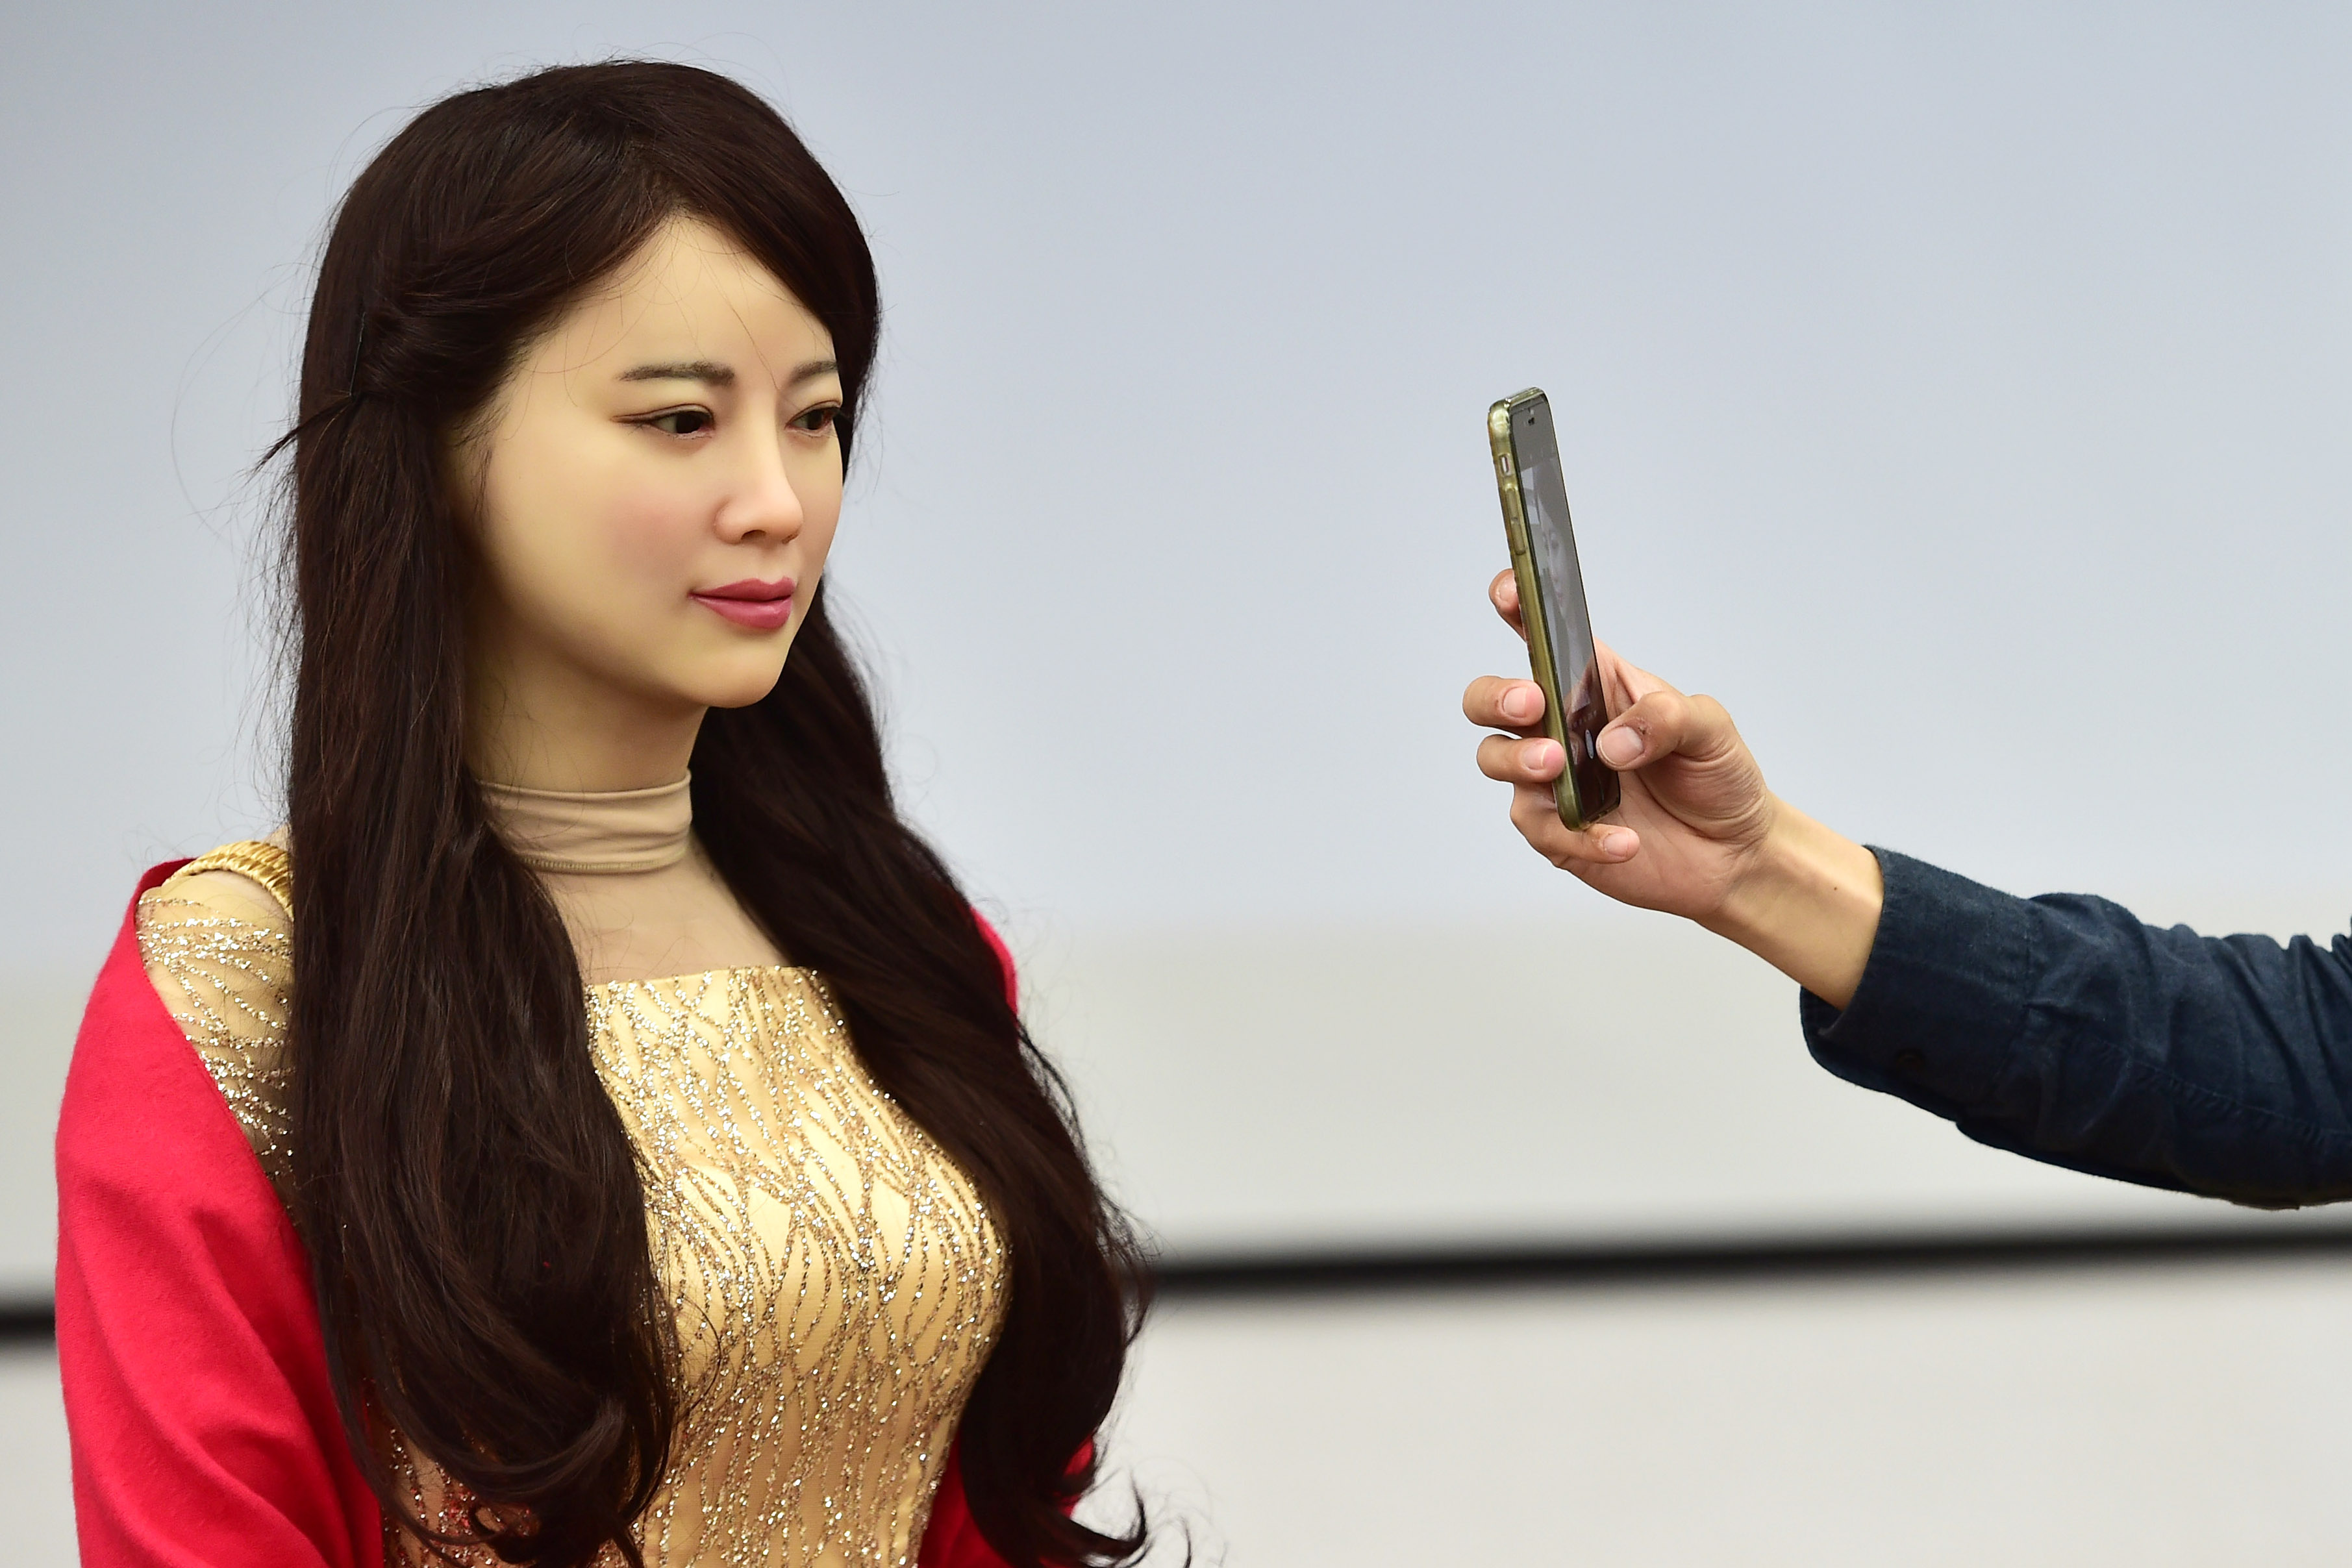 Primul robot interactiv creat de chinezi. Presa straina a avut parte de un soc cand a auzit-o vorbind pe JiaJia